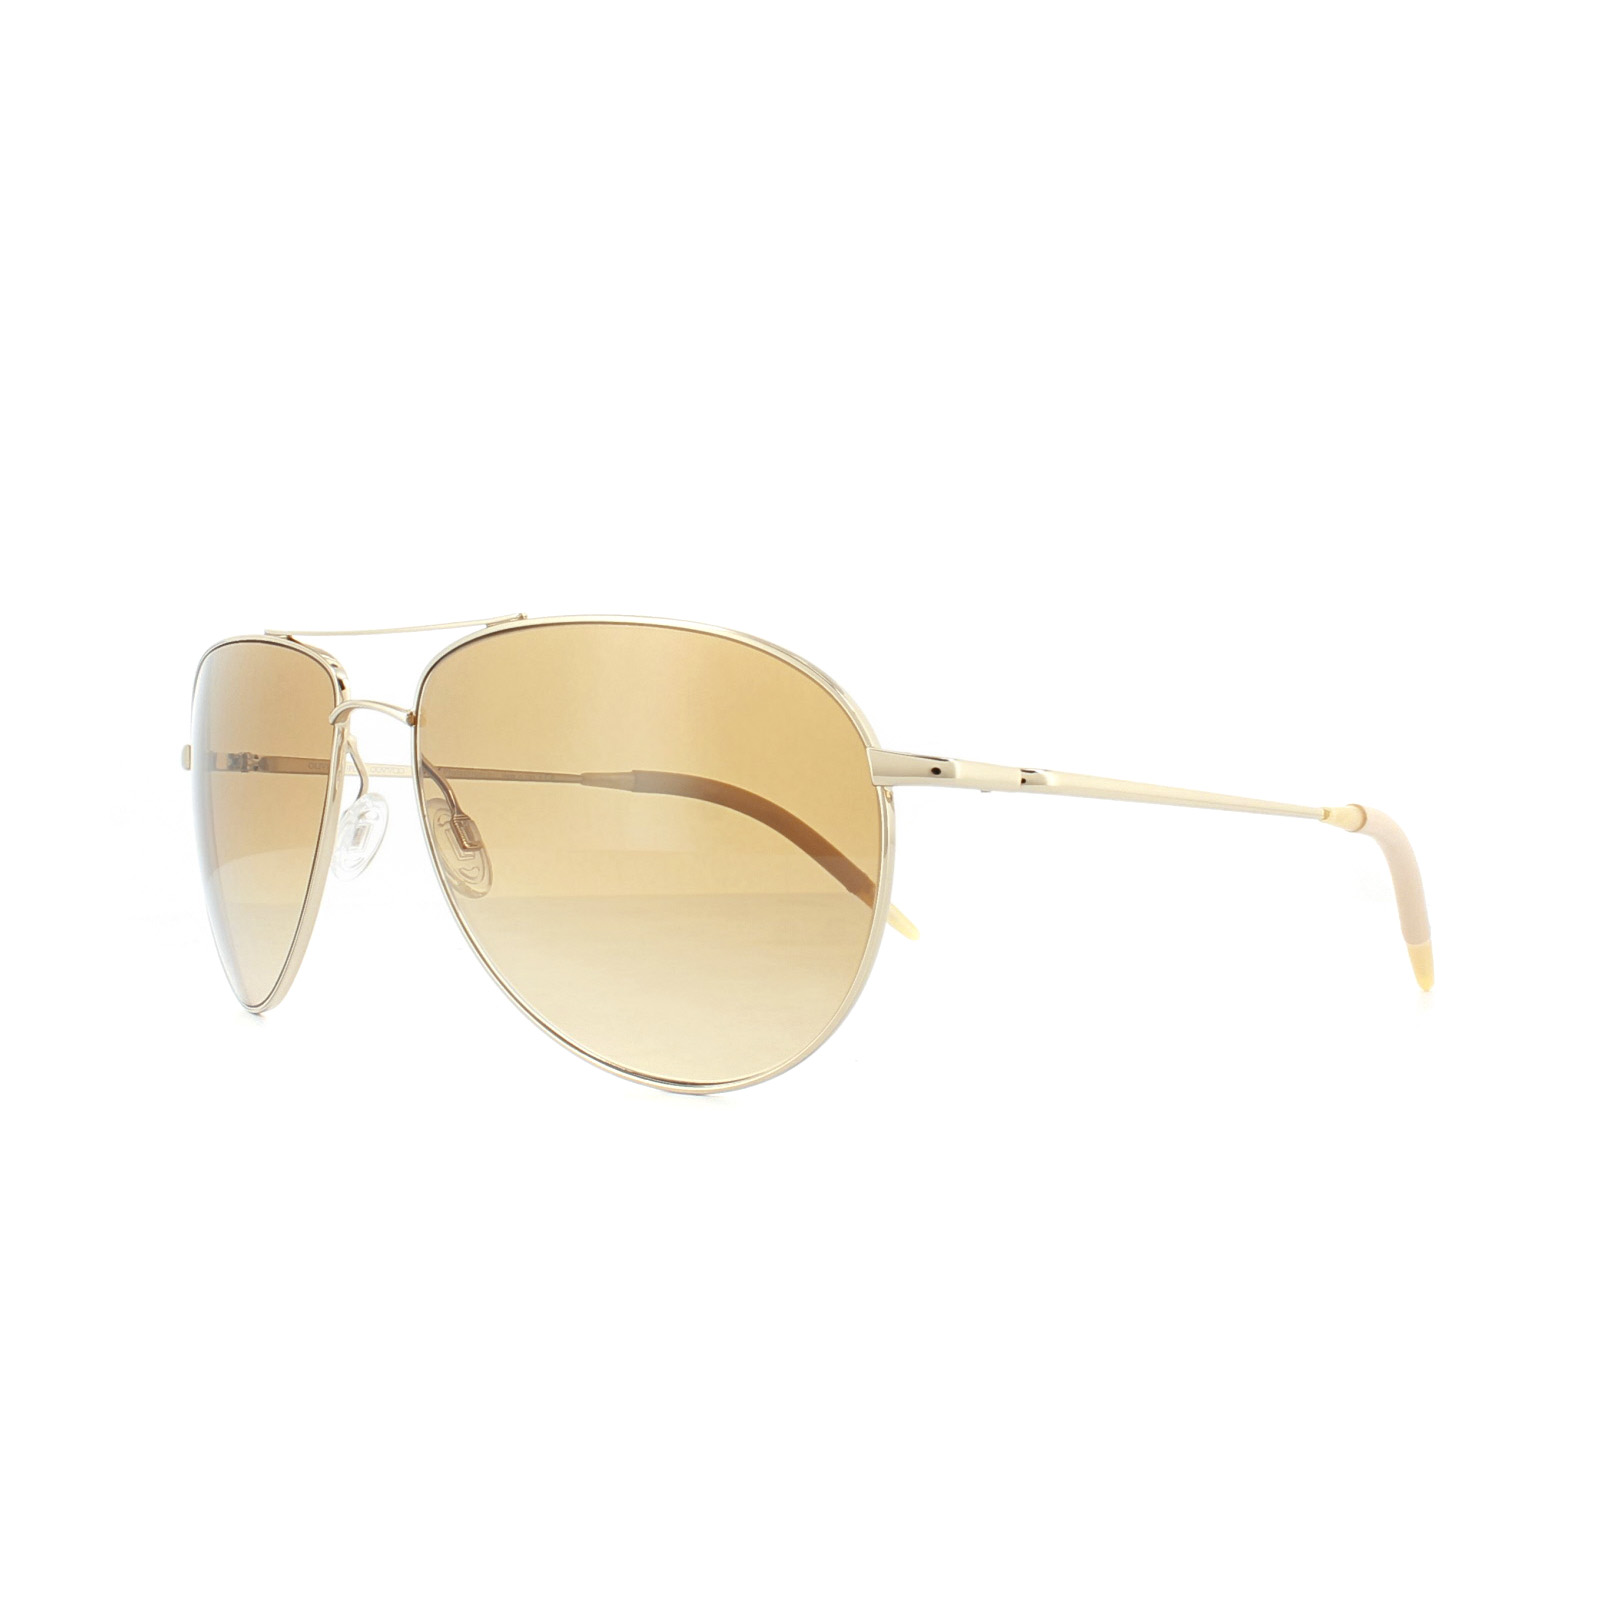 72c77dda593 Sentinel Oliver Peoples Sunglasses Benedict 1002 524251 Gold Amber VFX 62mm